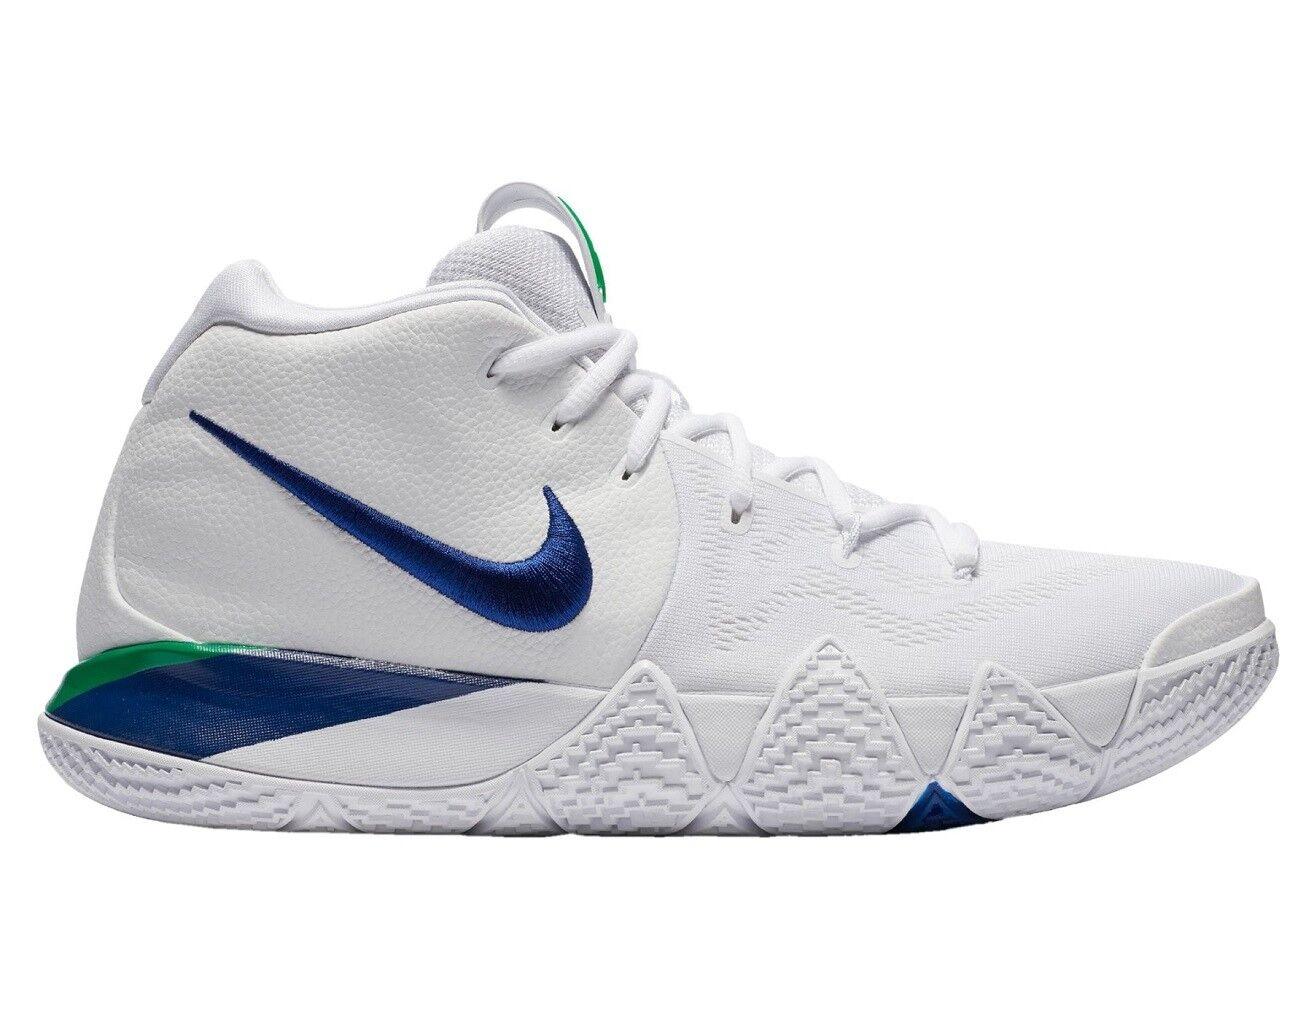 Nike Kyrie 4 Seahawks Mens 943806-103 White Royal Blue 13 Basketball Shoes Size 13 Blue 96efe6